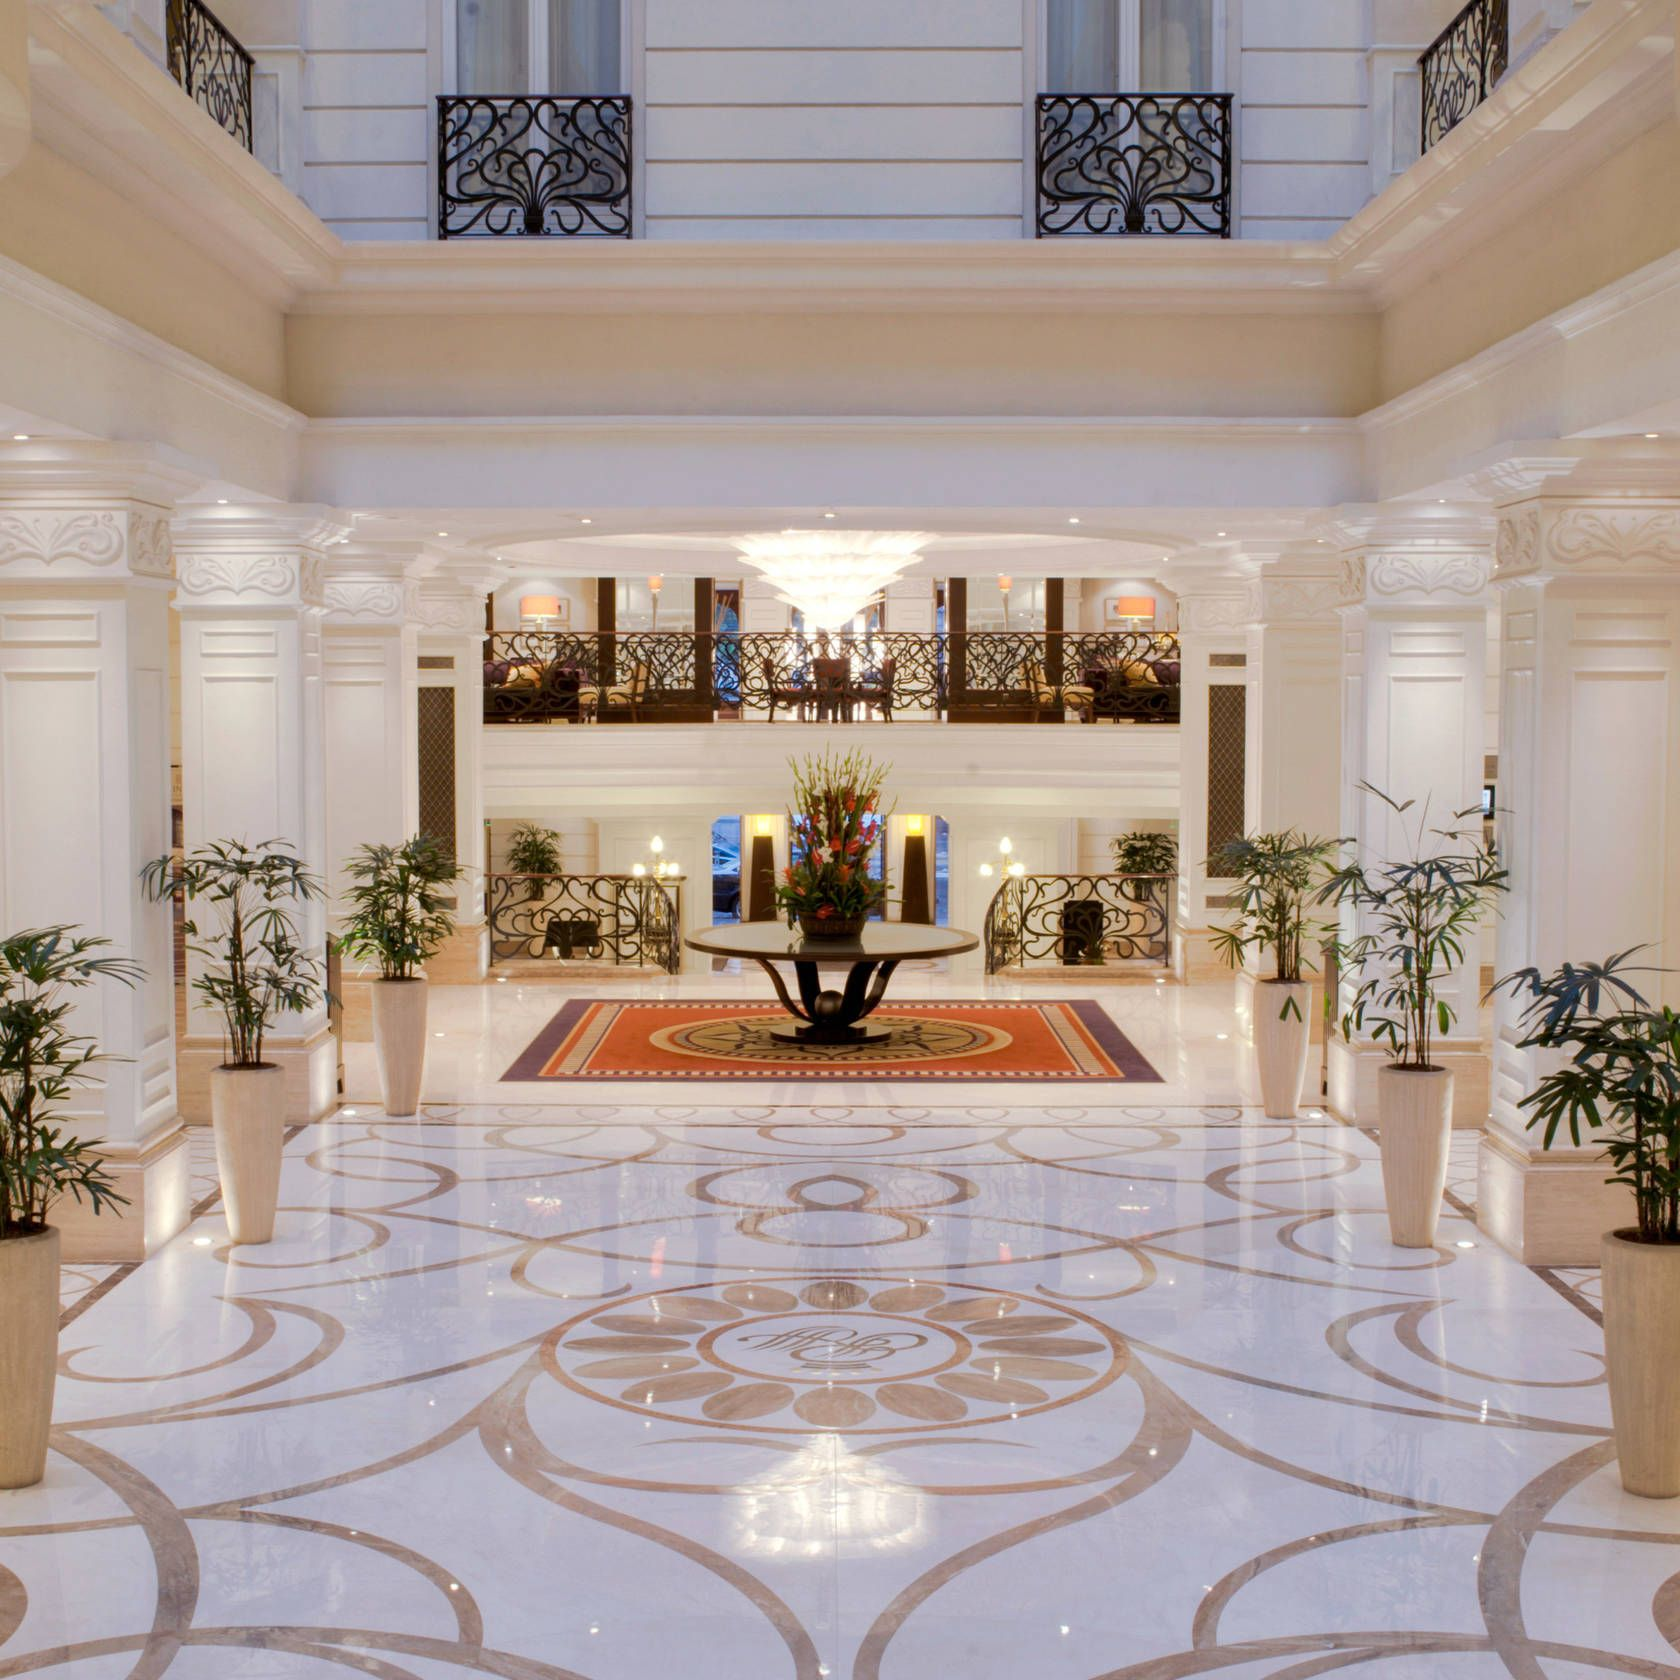 Corinthia Hotel Budapest Budapest, Hungary Indoor Table Lobby Property Room